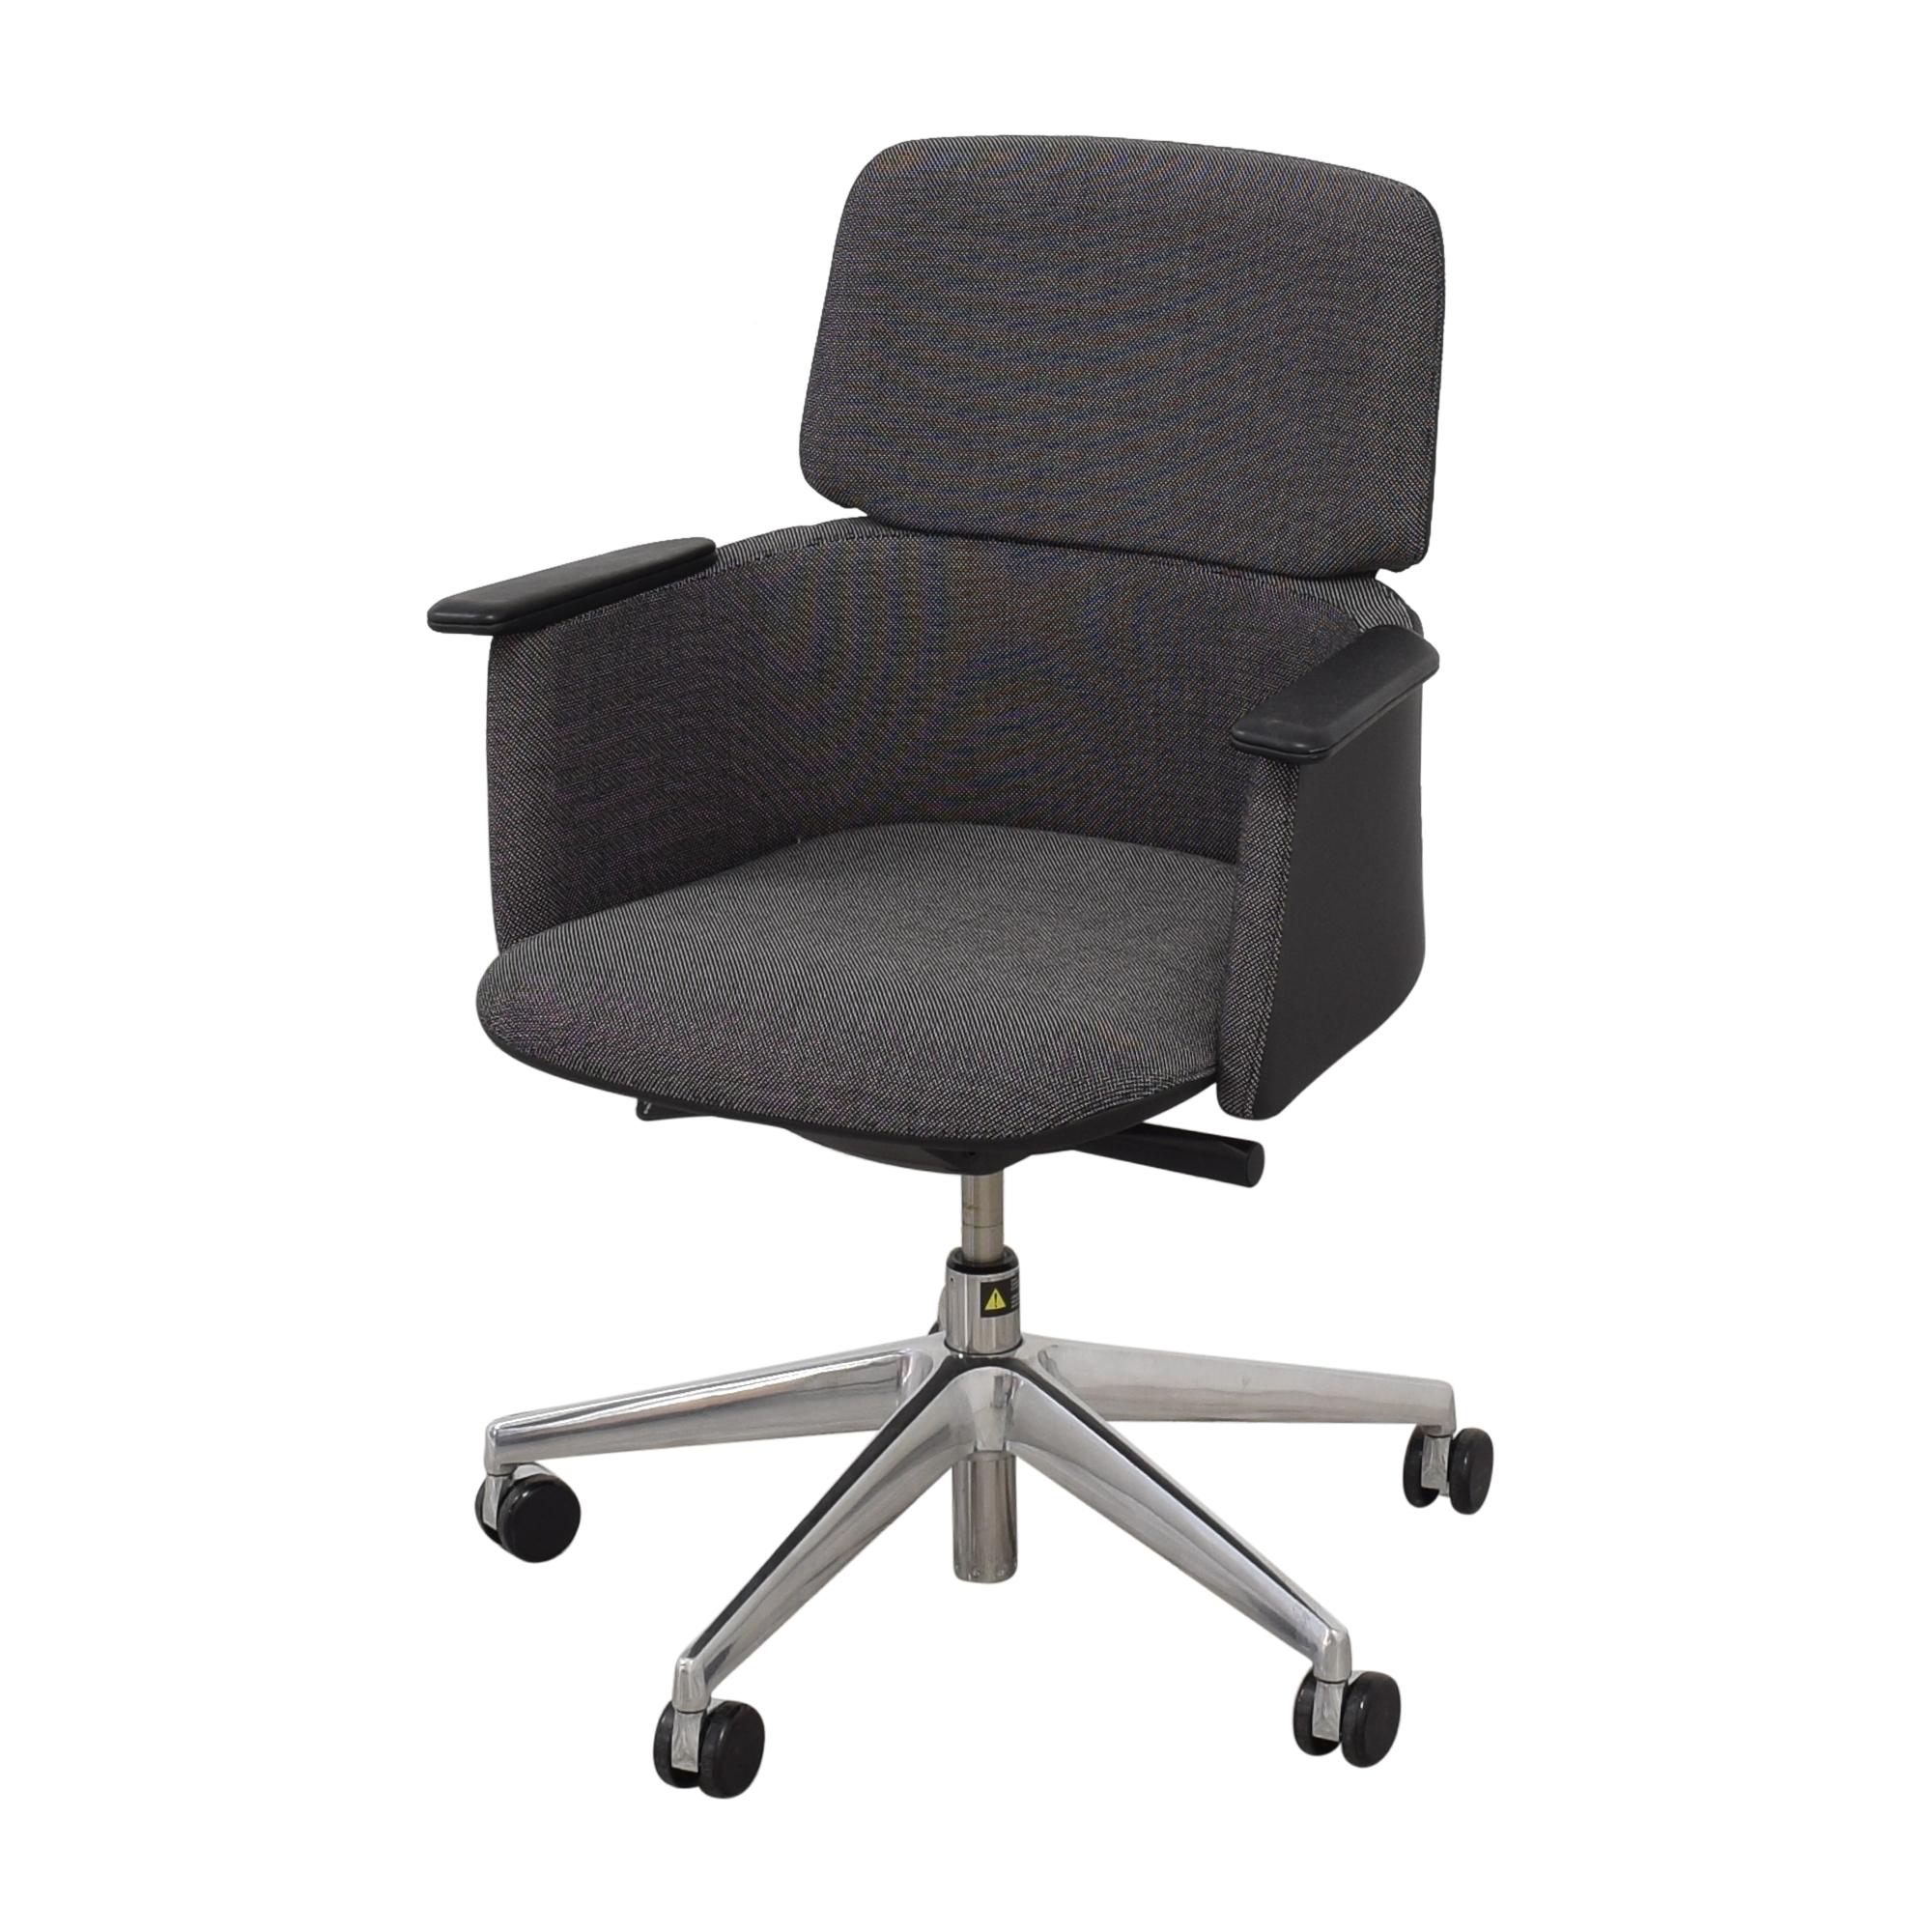 Koleksiyon Koleksiyon Tola Task Chair discount